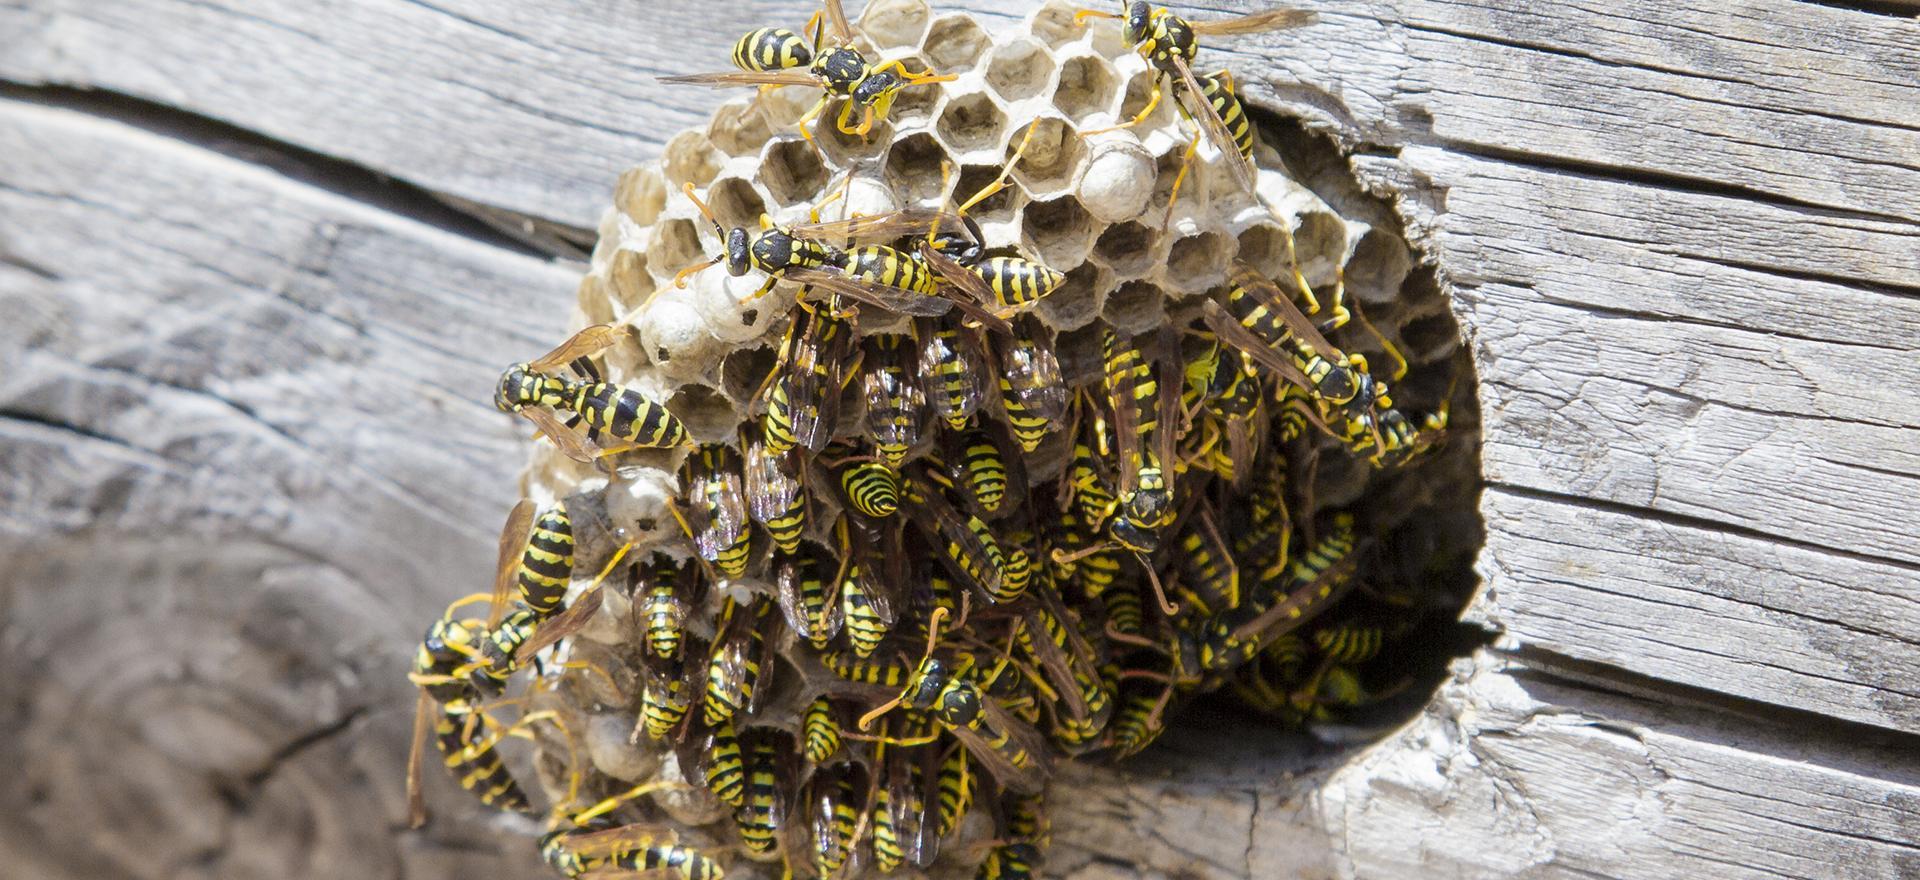 hornets nest close up